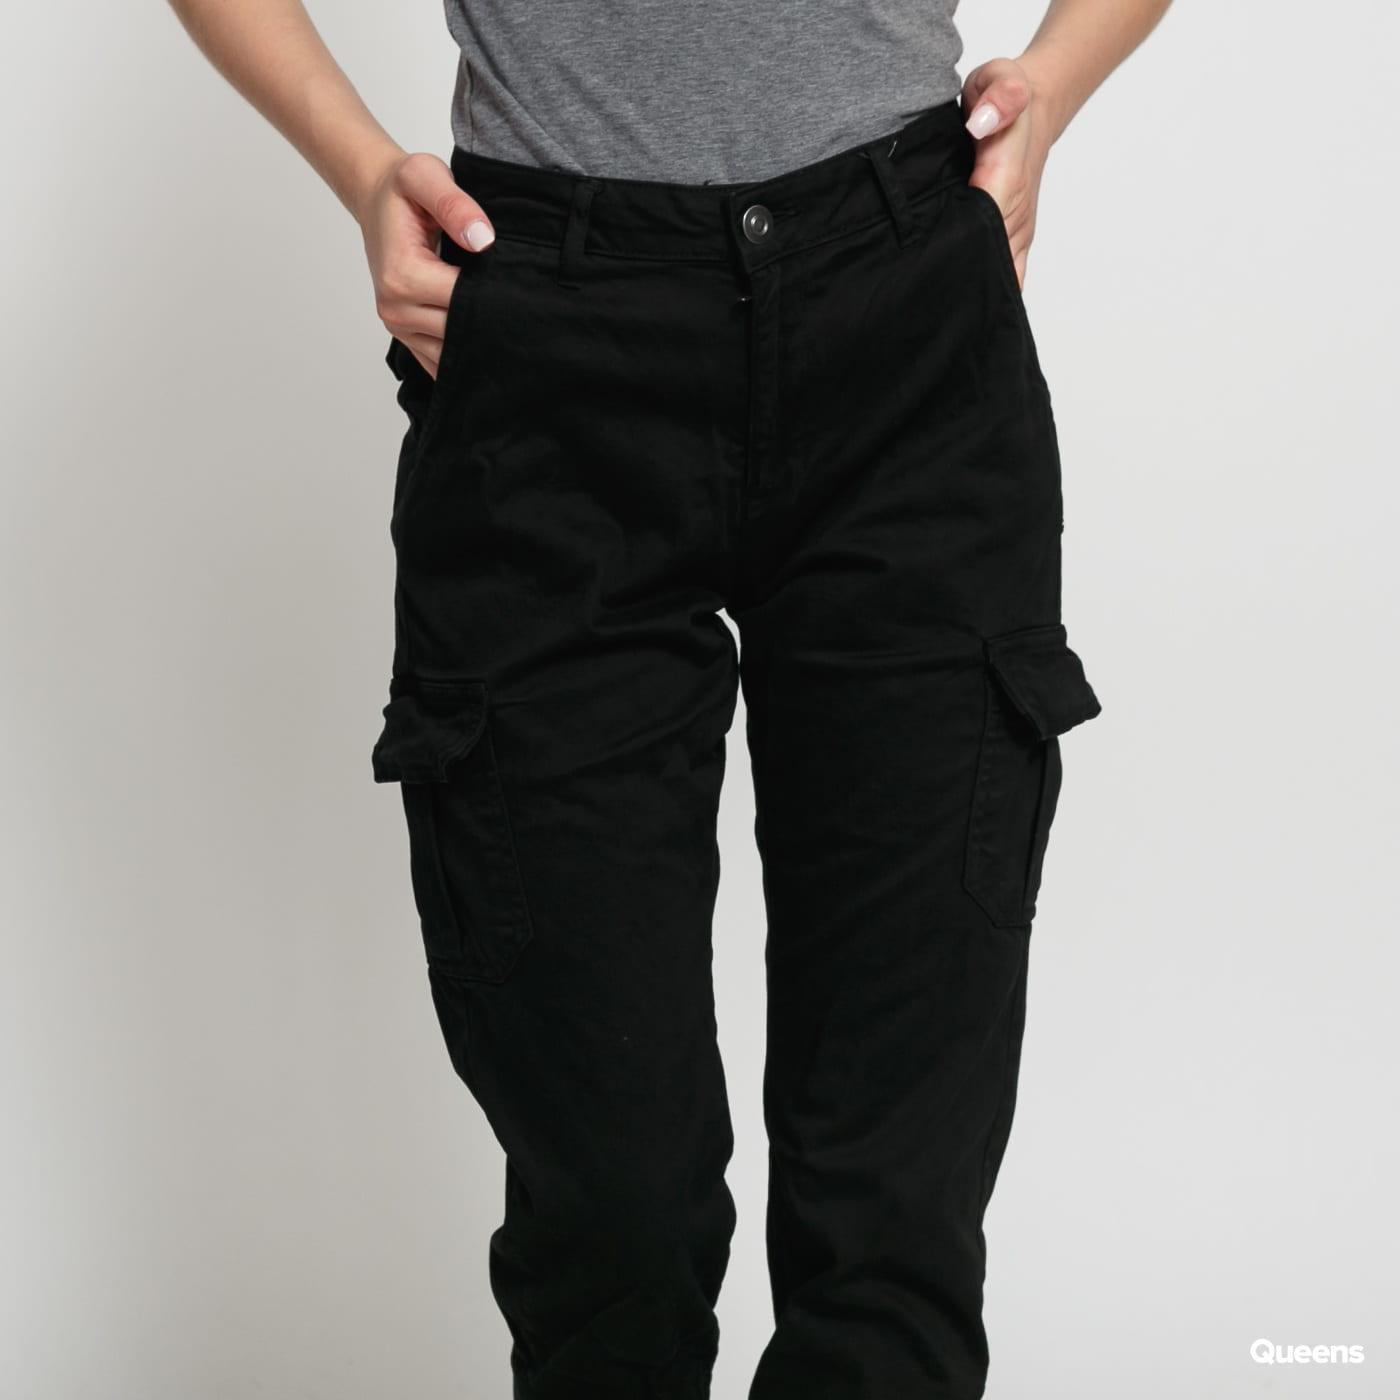 Urban Classics Ladies High Waist Cargo Pants black